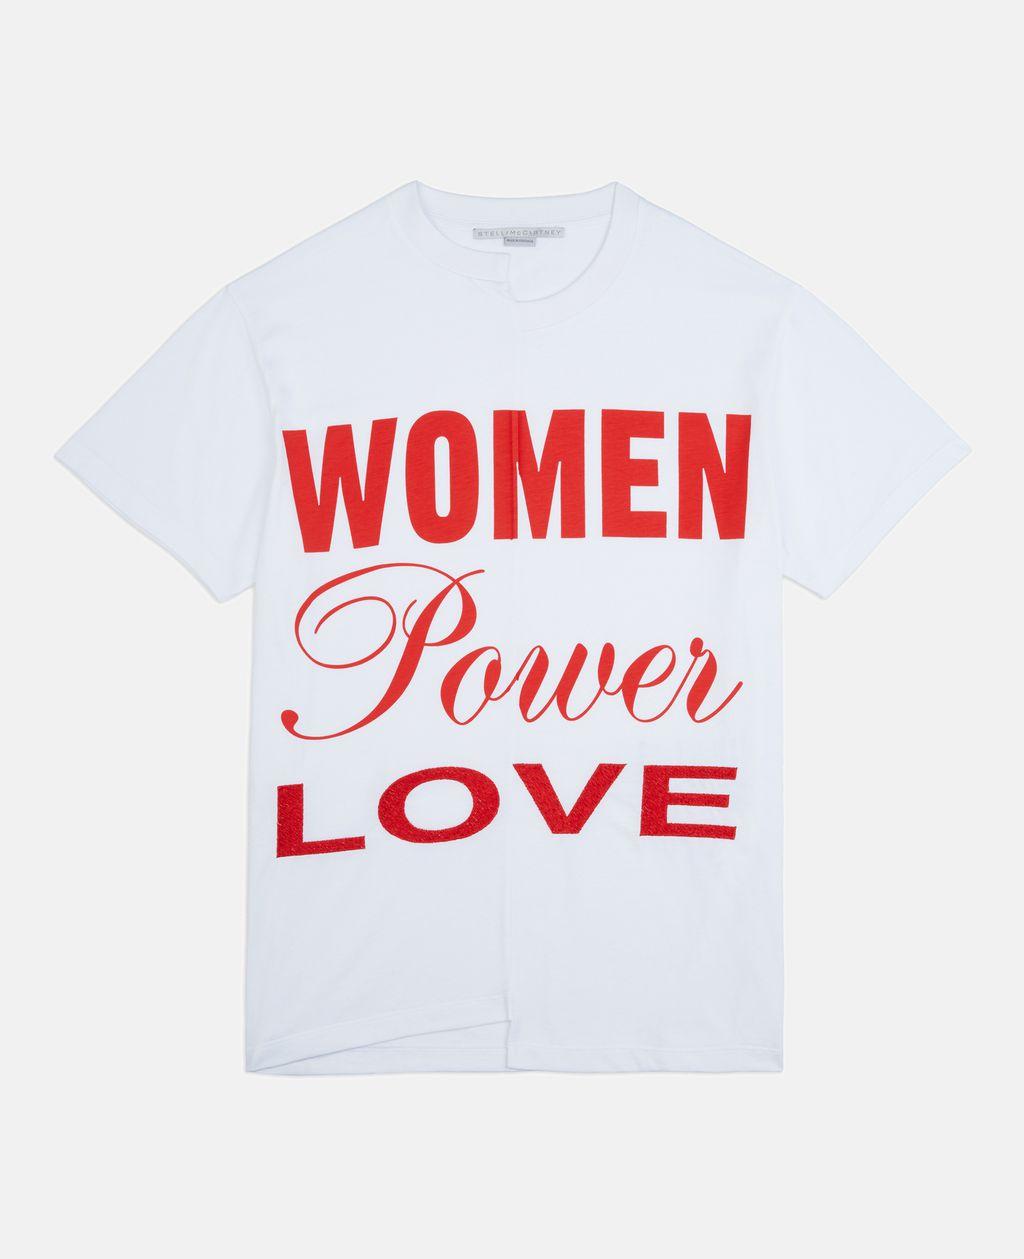 stella women power love